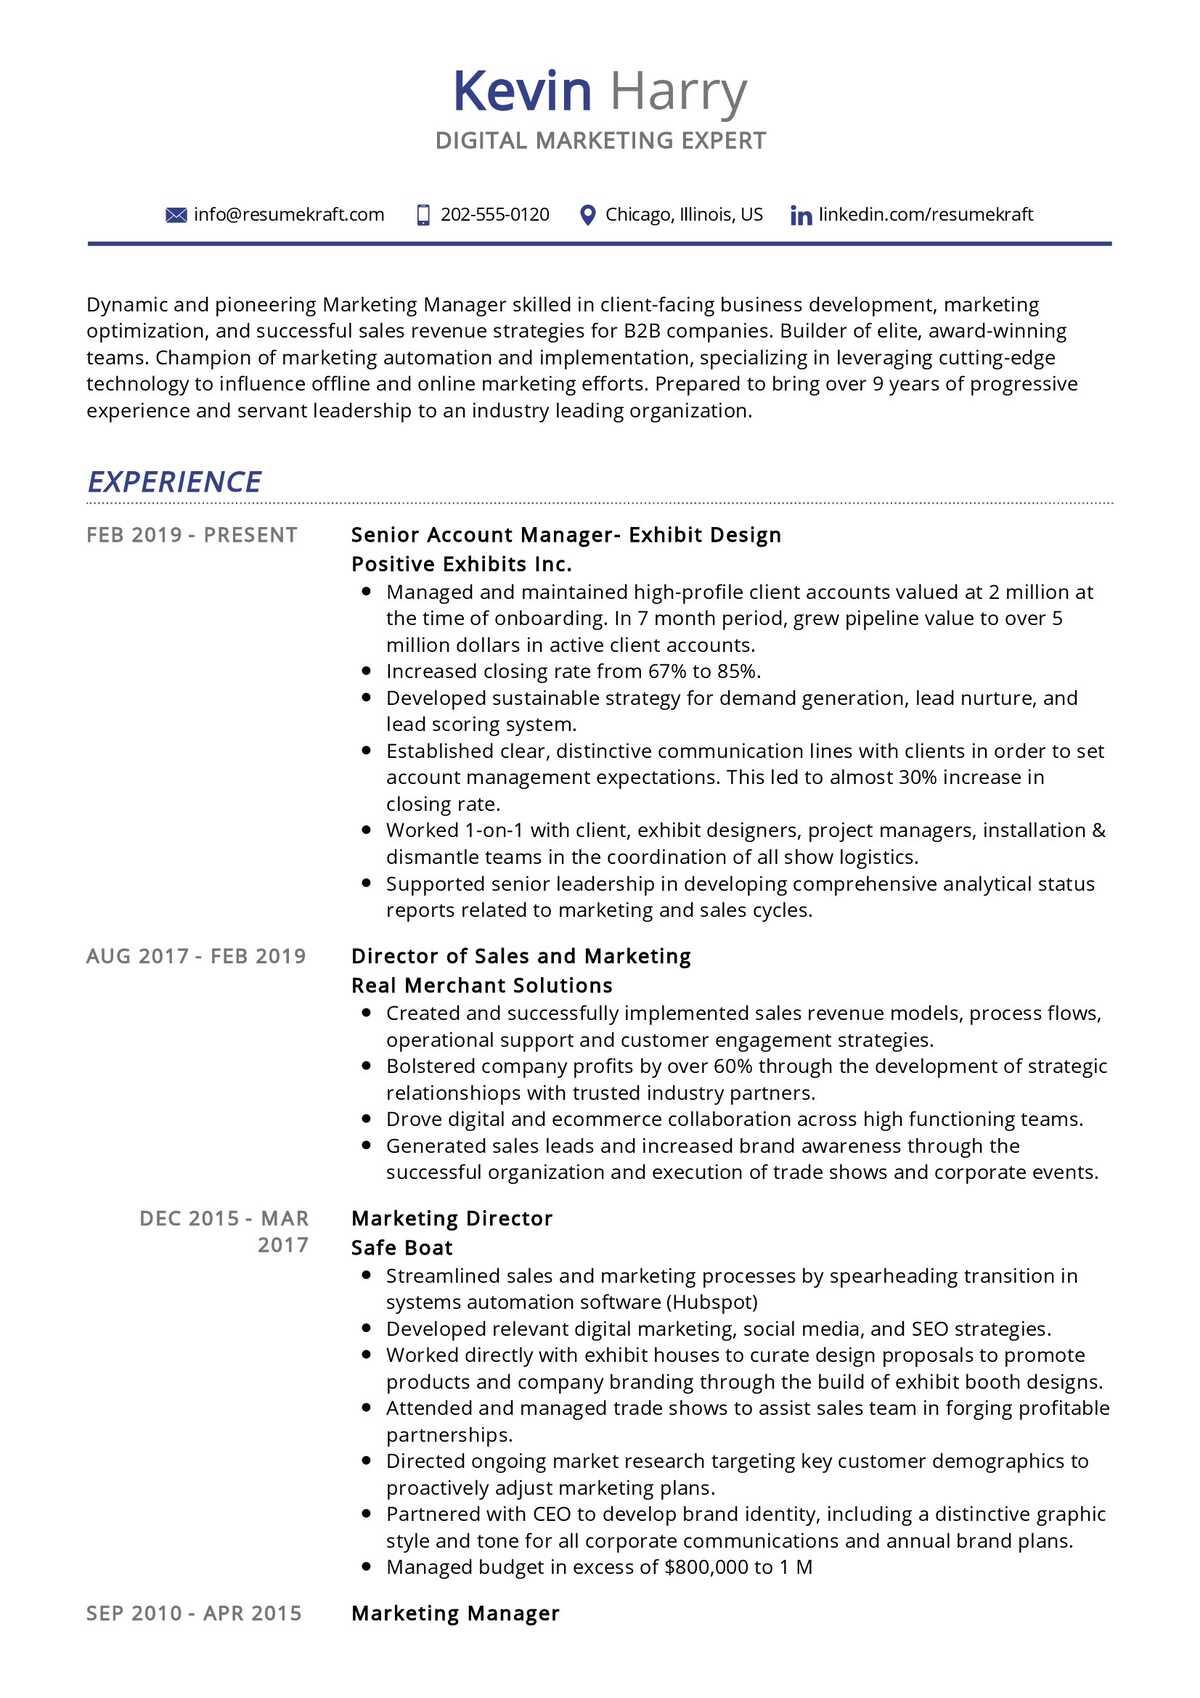 Digital Marketing Expert Resume